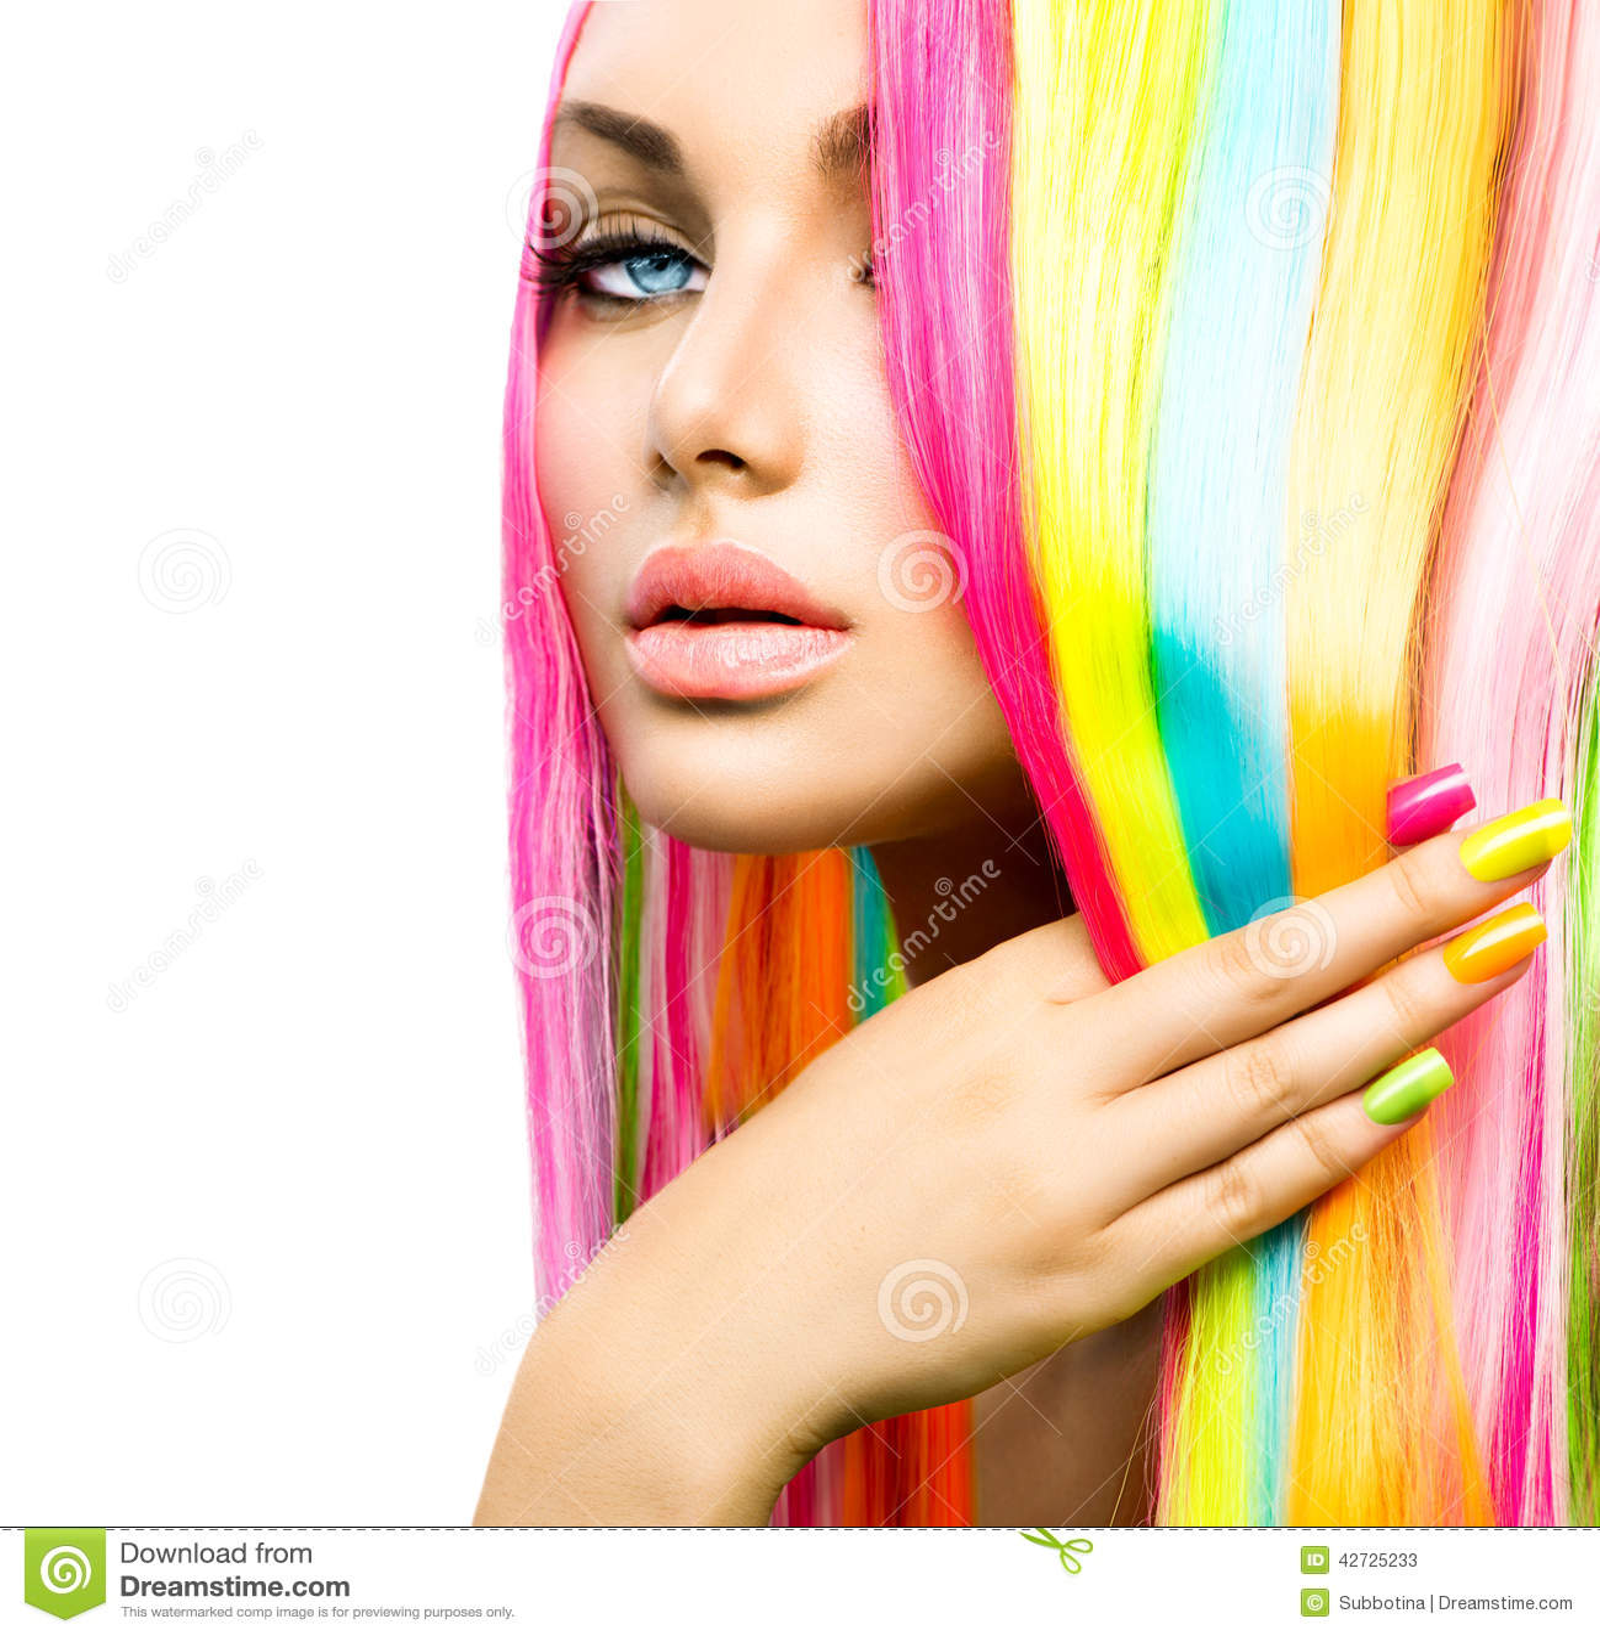 Beauty Girl With Colorful Hair And Nail Polish Stock Image - Image 42725233